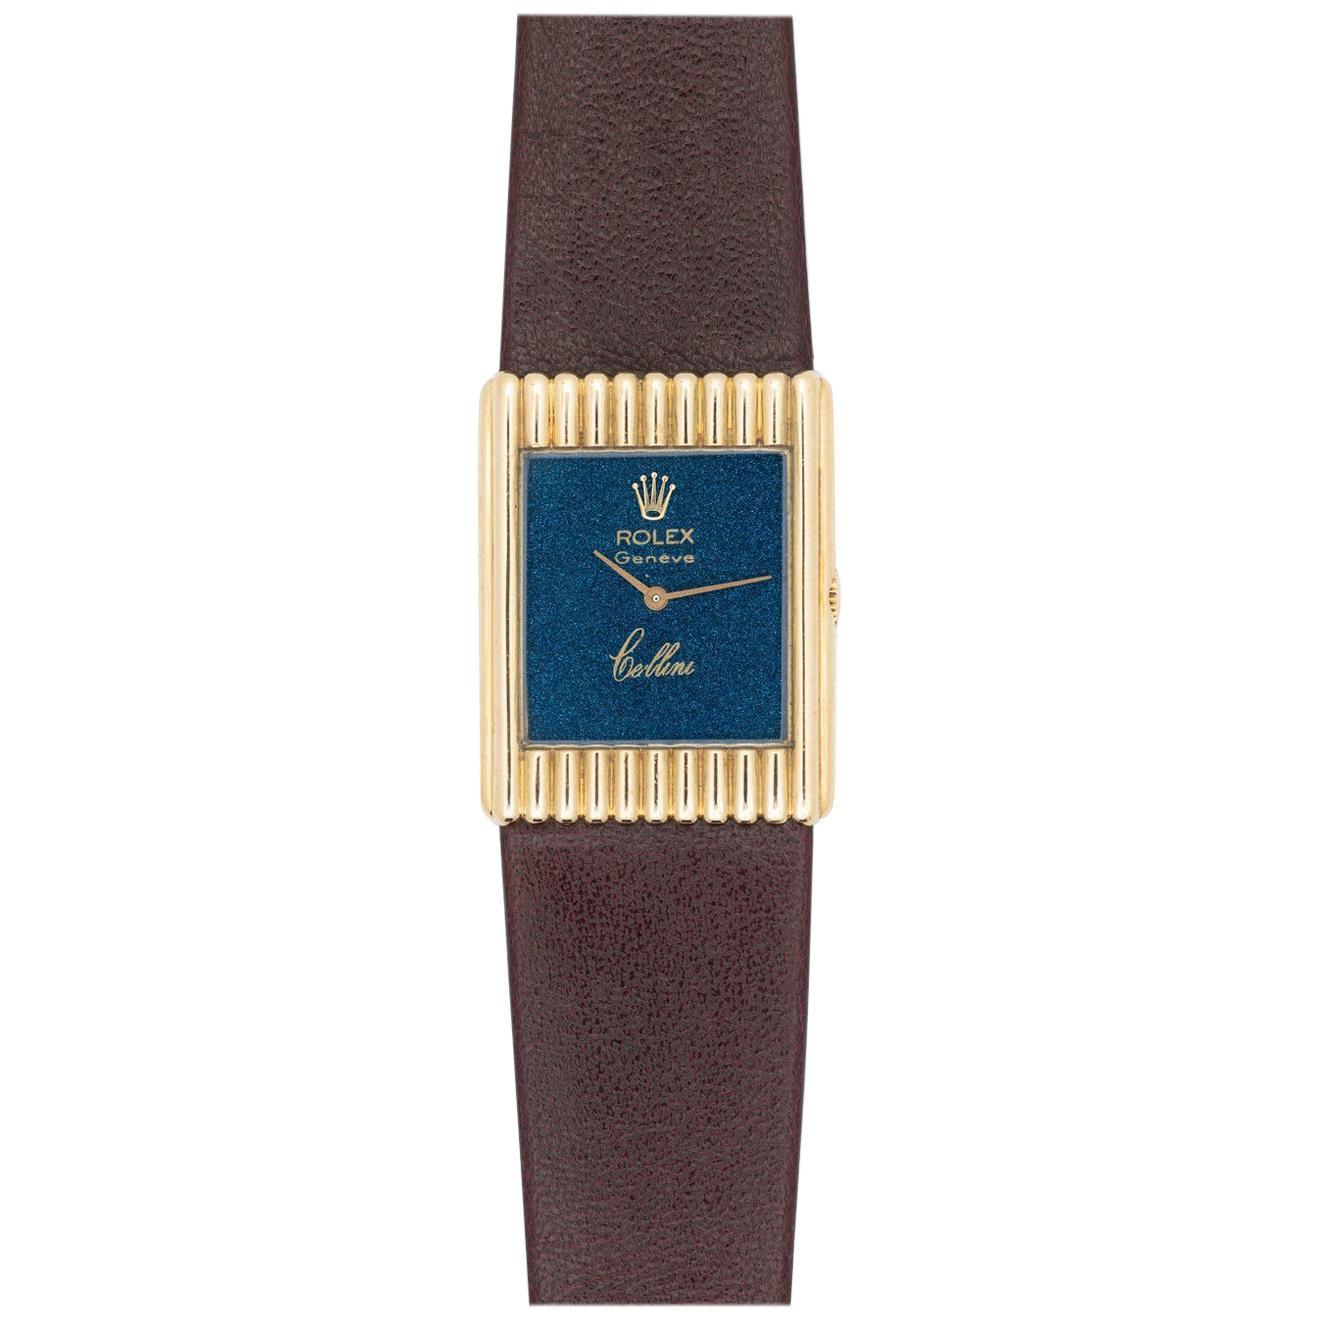 Rolex 18 Karat Yellow Gold Cellini Watch Model 4016, circa 1976